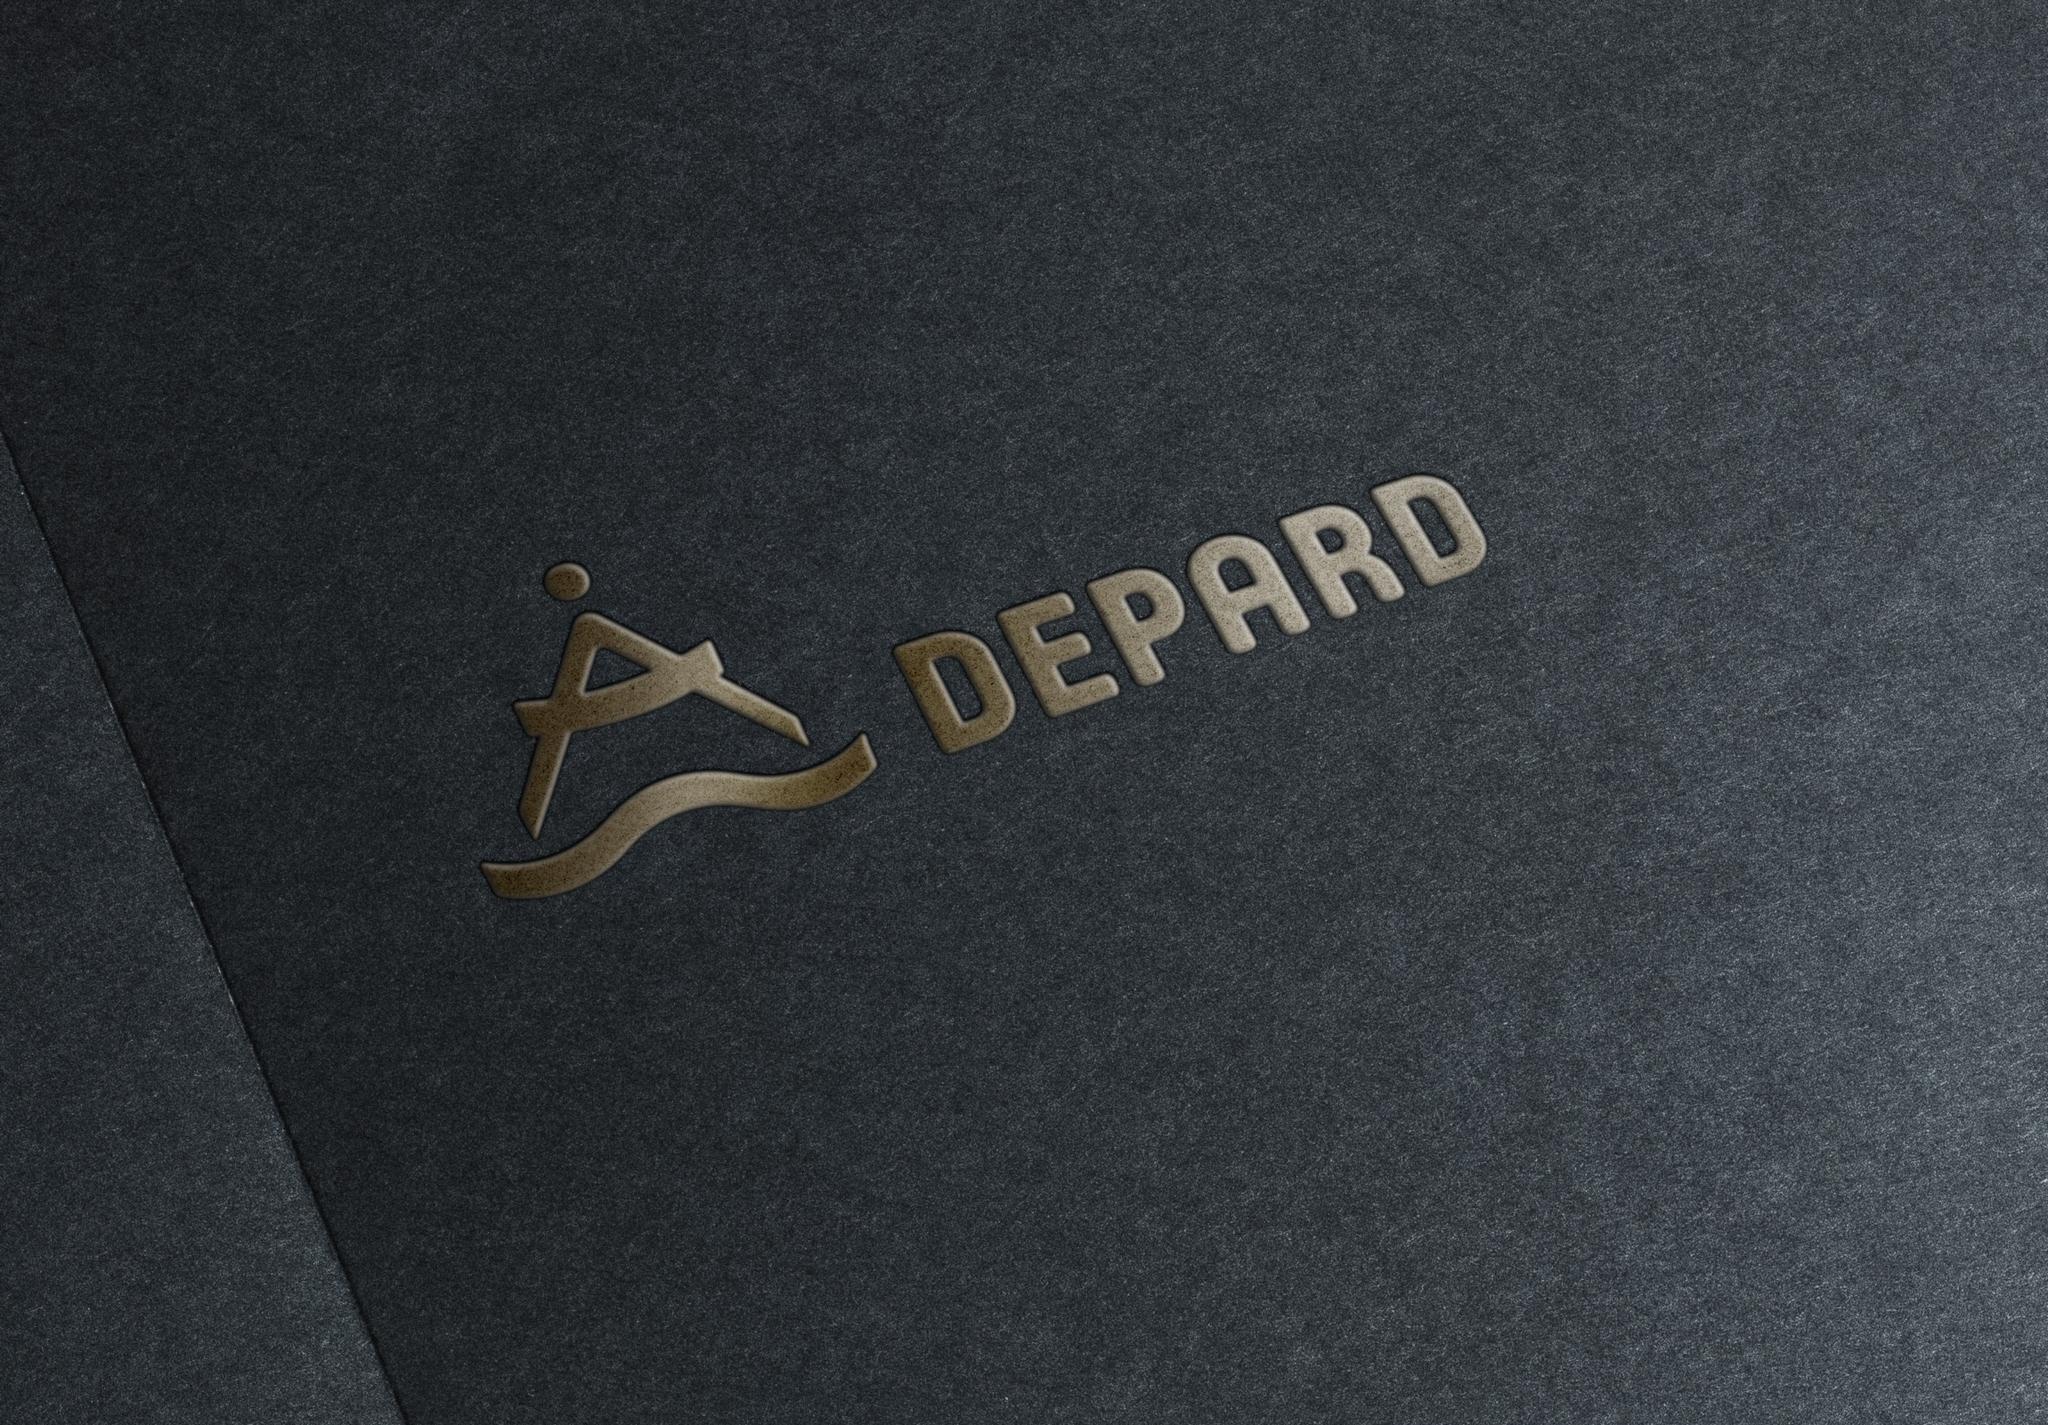 Логотип для компании (услуги недвижимость) фото f_777593257aa8e9b1.jpg